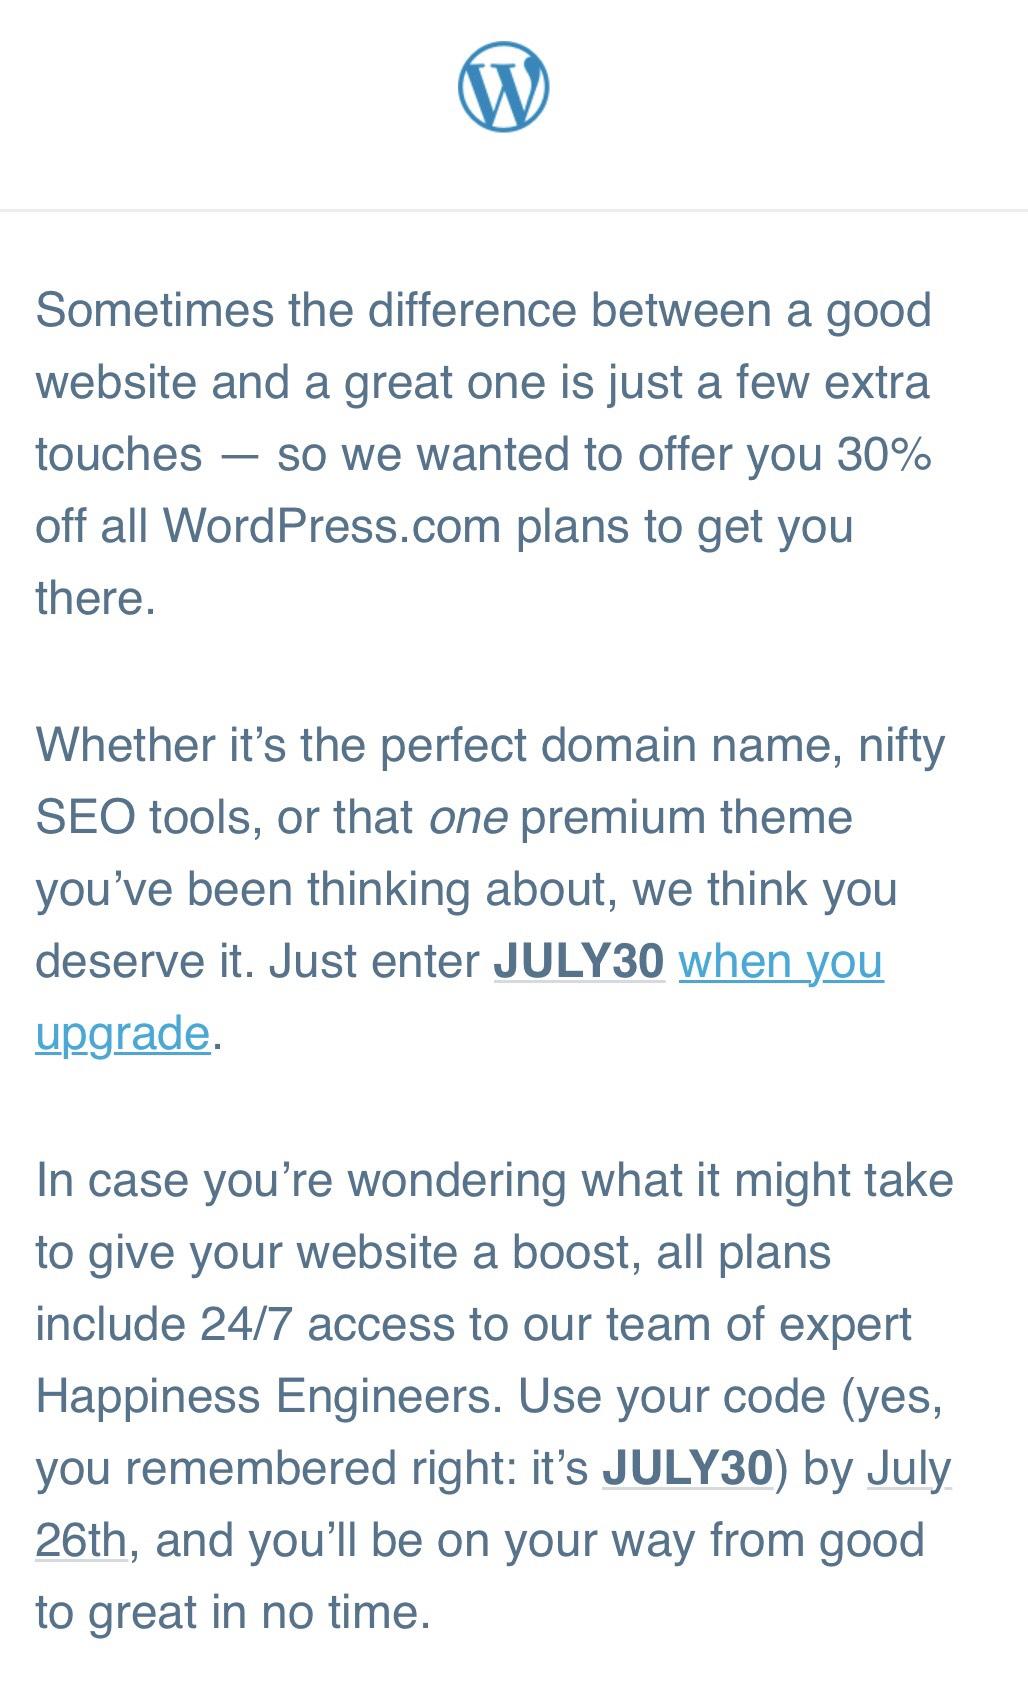 30% off all Wordpress plans until 26th July